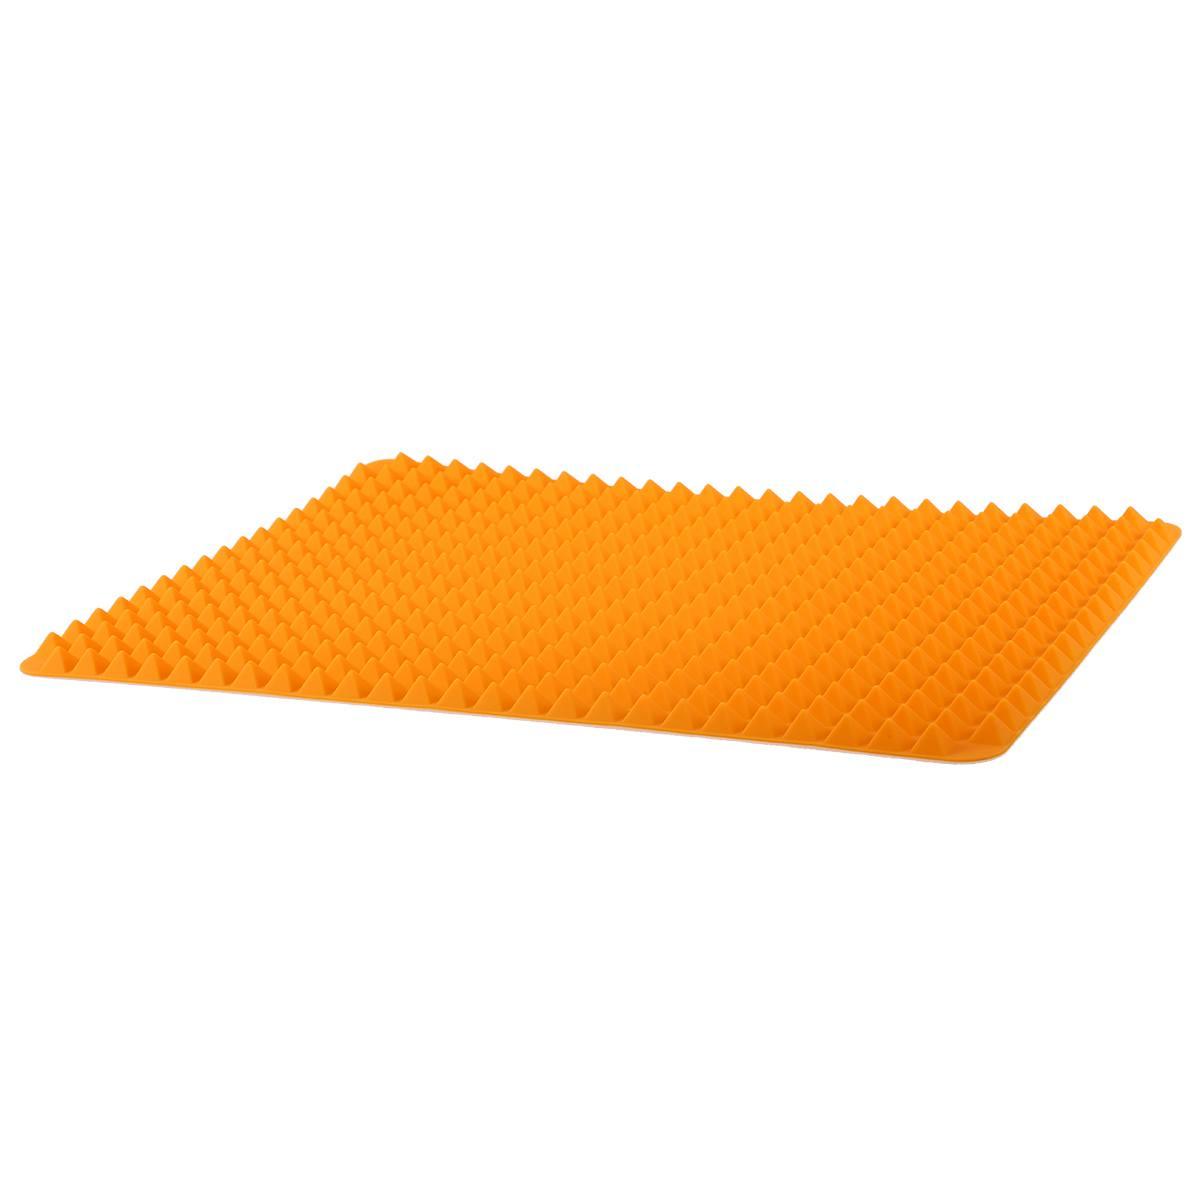 Silikon-Antihaft-gesunde-Kochen-Backmatte-mit-Pyramide-Oberflaeche-16-Zoll-F5L9